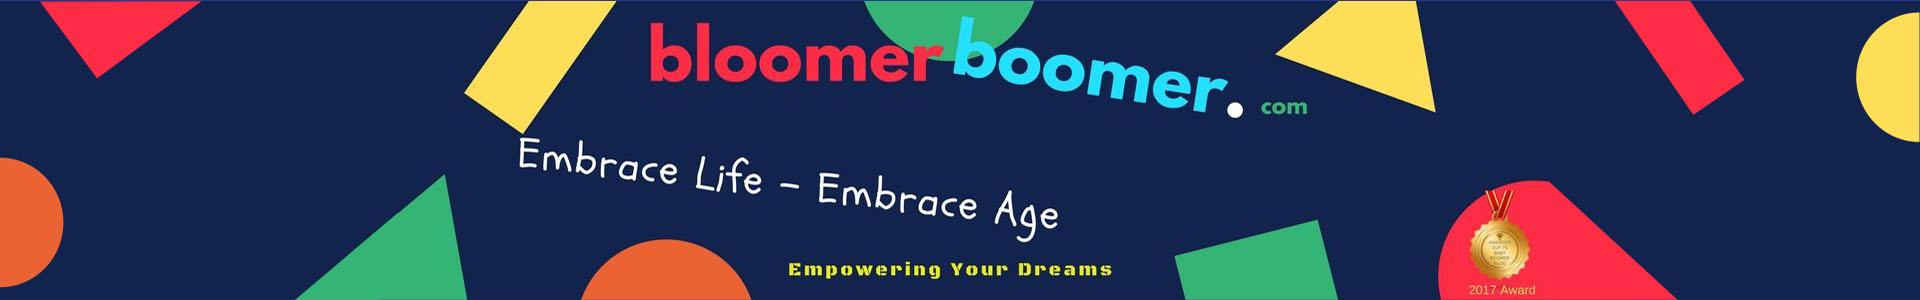 BloomerBoomer